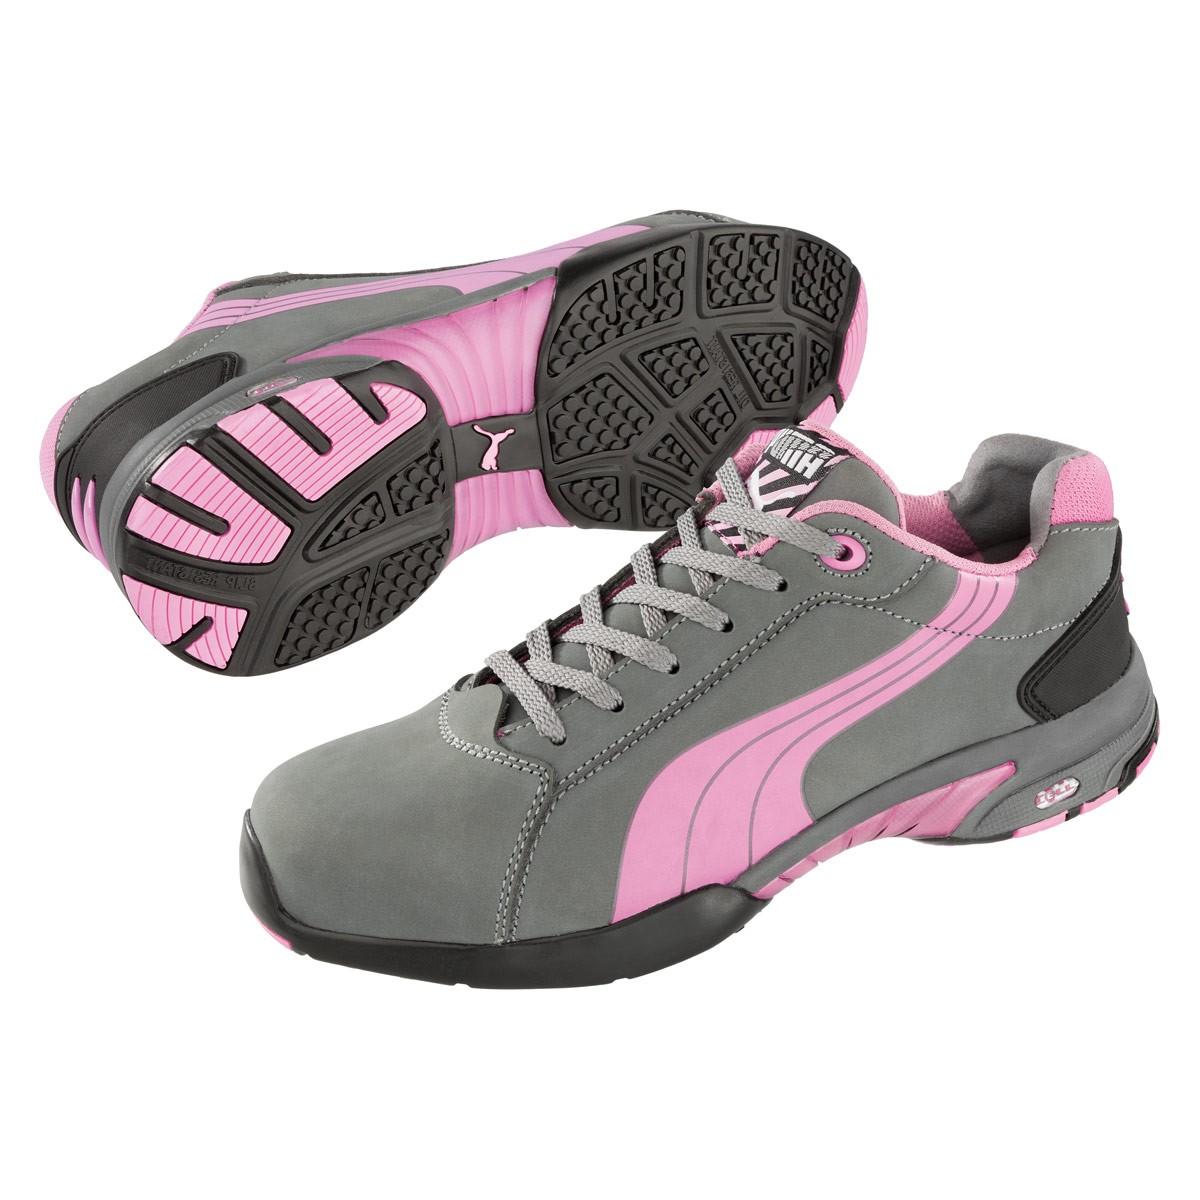 steel toe shoes for women puma safety womenu0027s balance shoe - 642865 fmnsshg